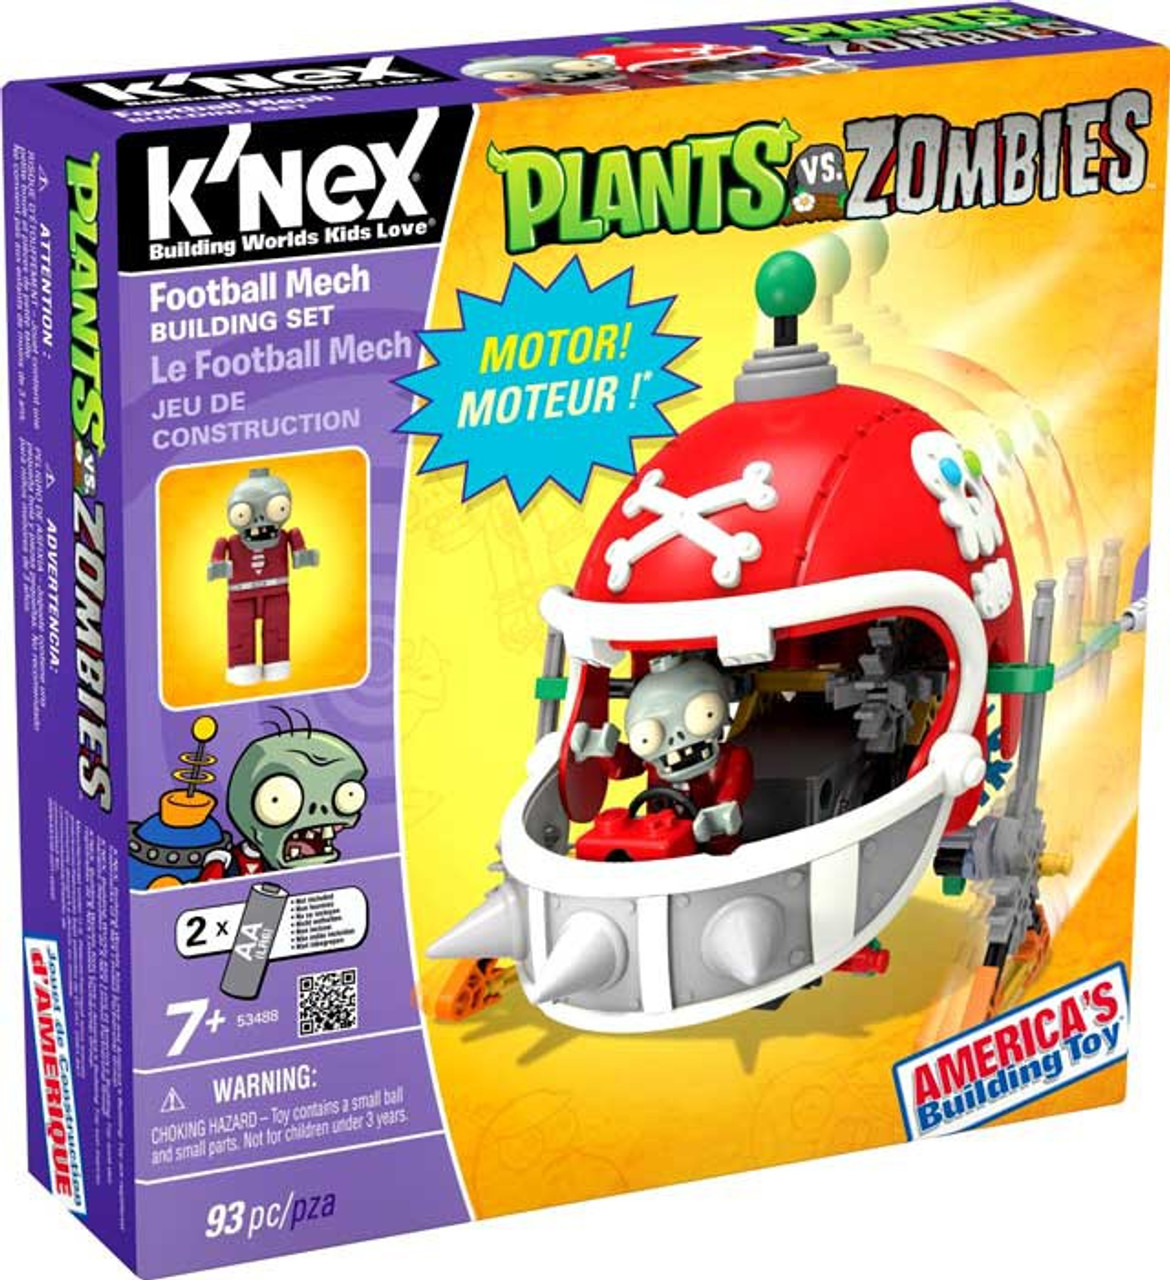 K'NEX Plants vs. Zombies Football Mech Set #53488